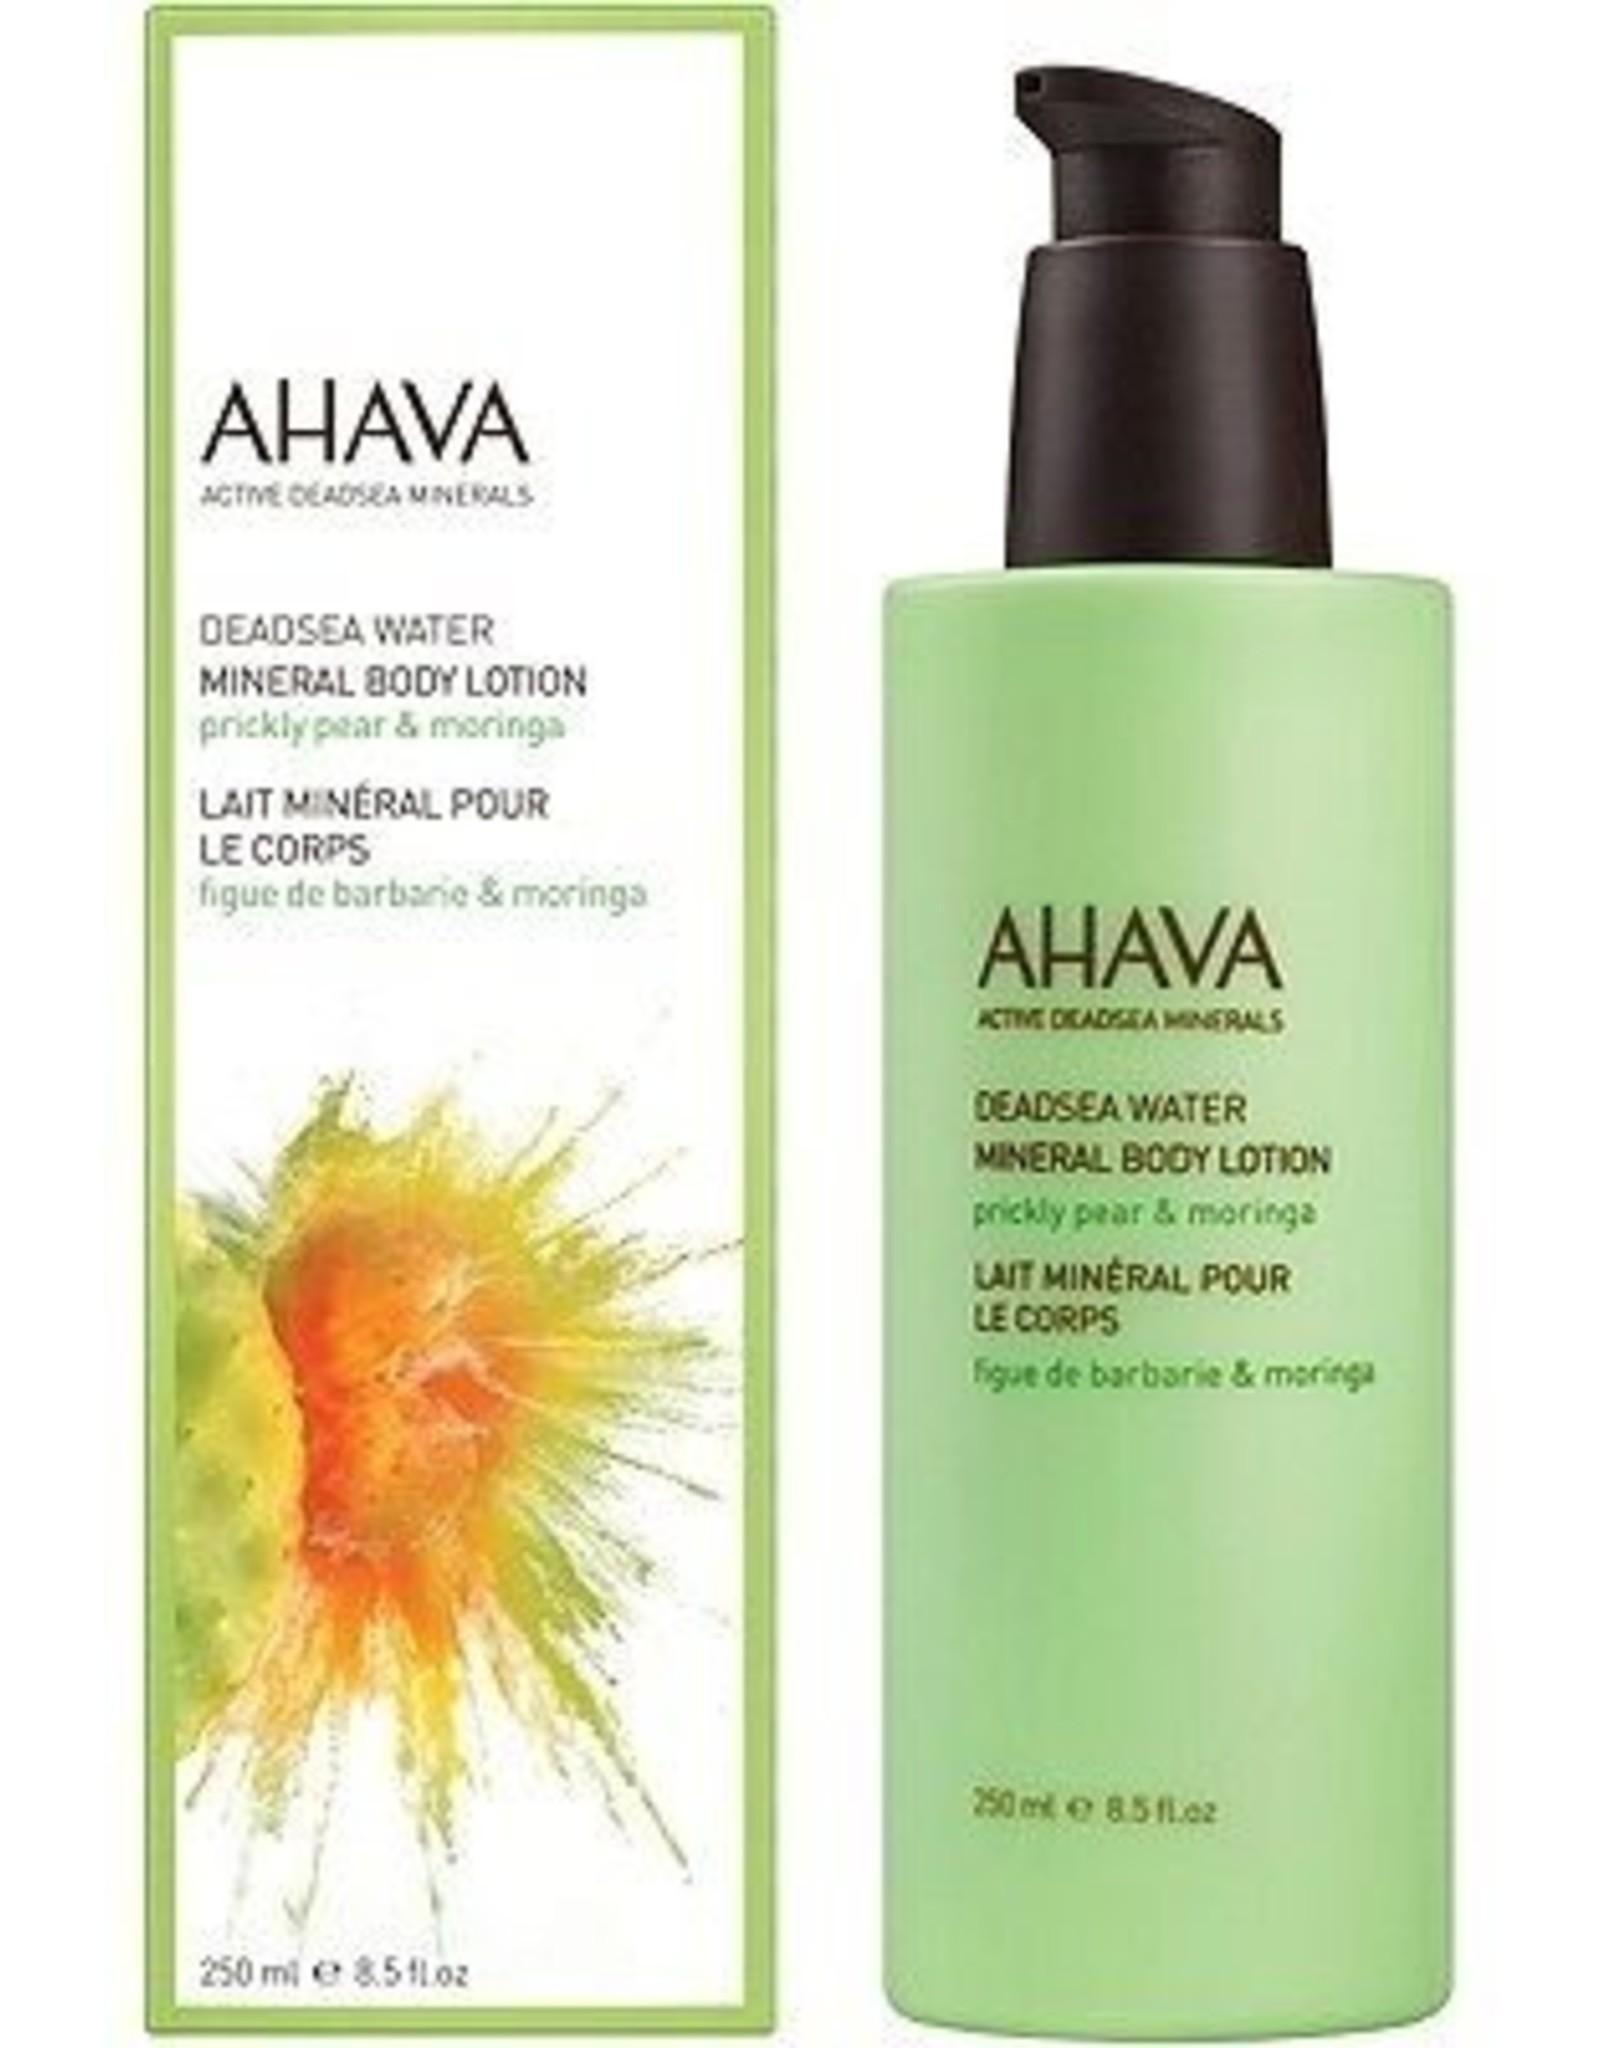 AHAVA Body lotion prickly pear & moringa 250ml